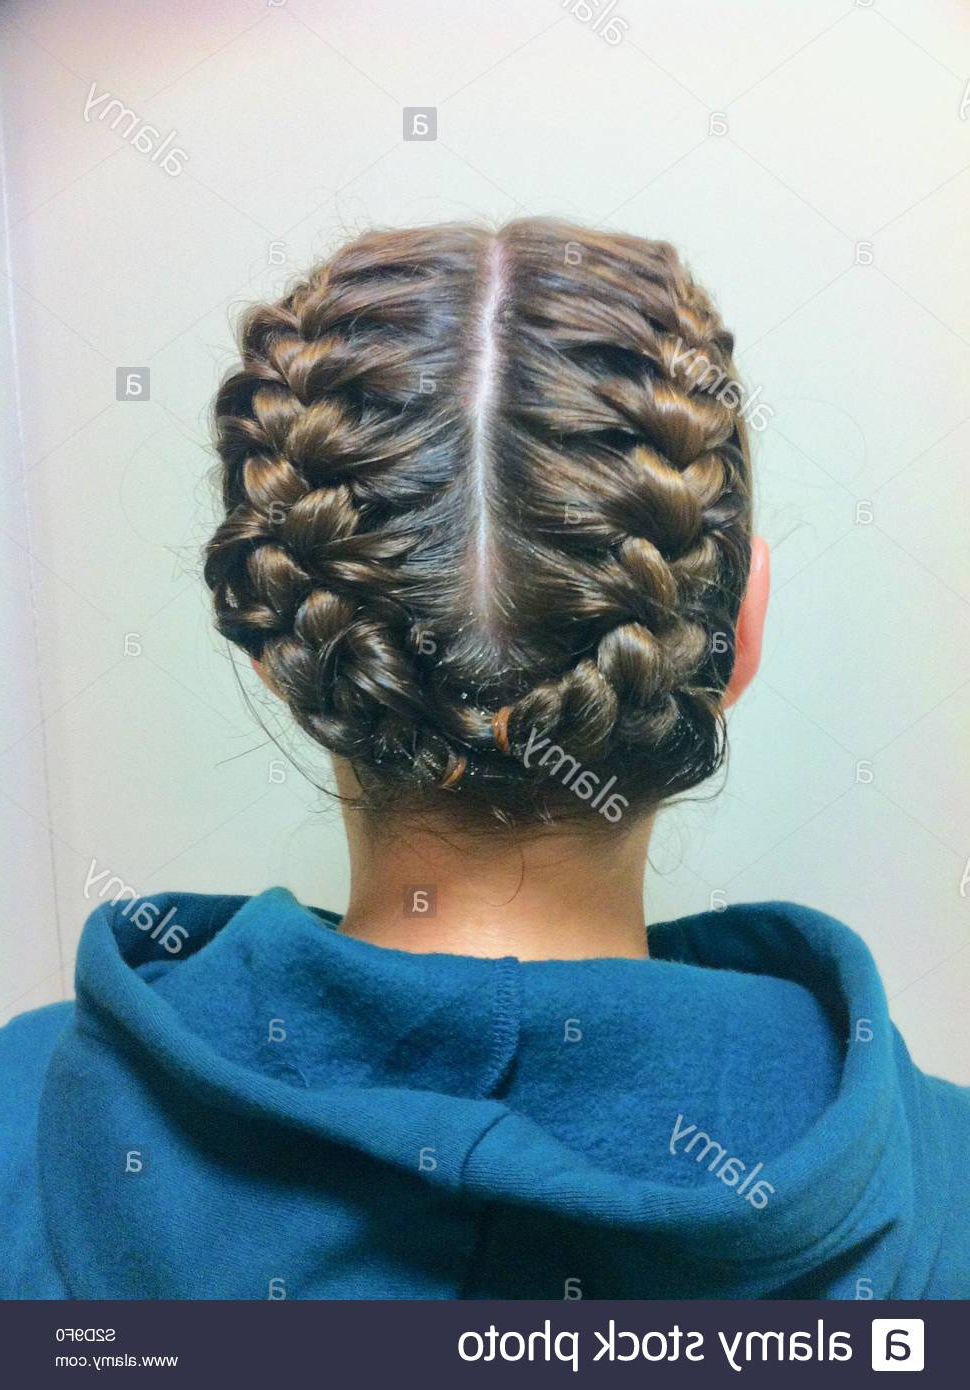 Braids Plaits Stock Photos & Braids Plaits Stock Images – Alamy Pertaining To Favorite Renaissance Micro Braid Hairstyles (View 5 of 20)